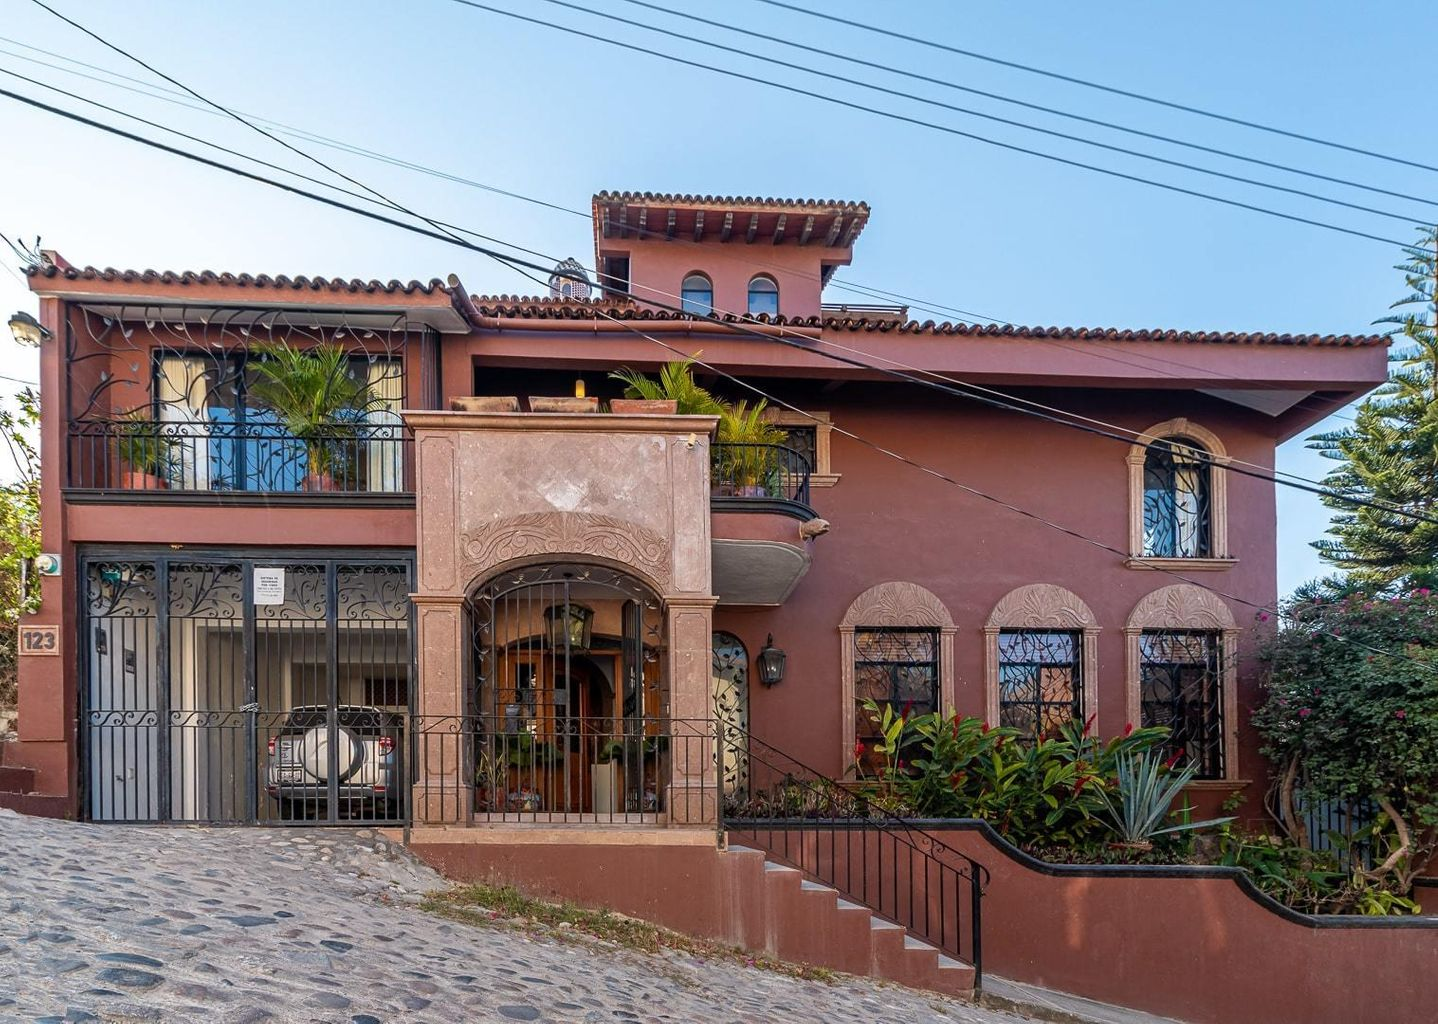 Roberto Foster House in Bucerias_-2-min